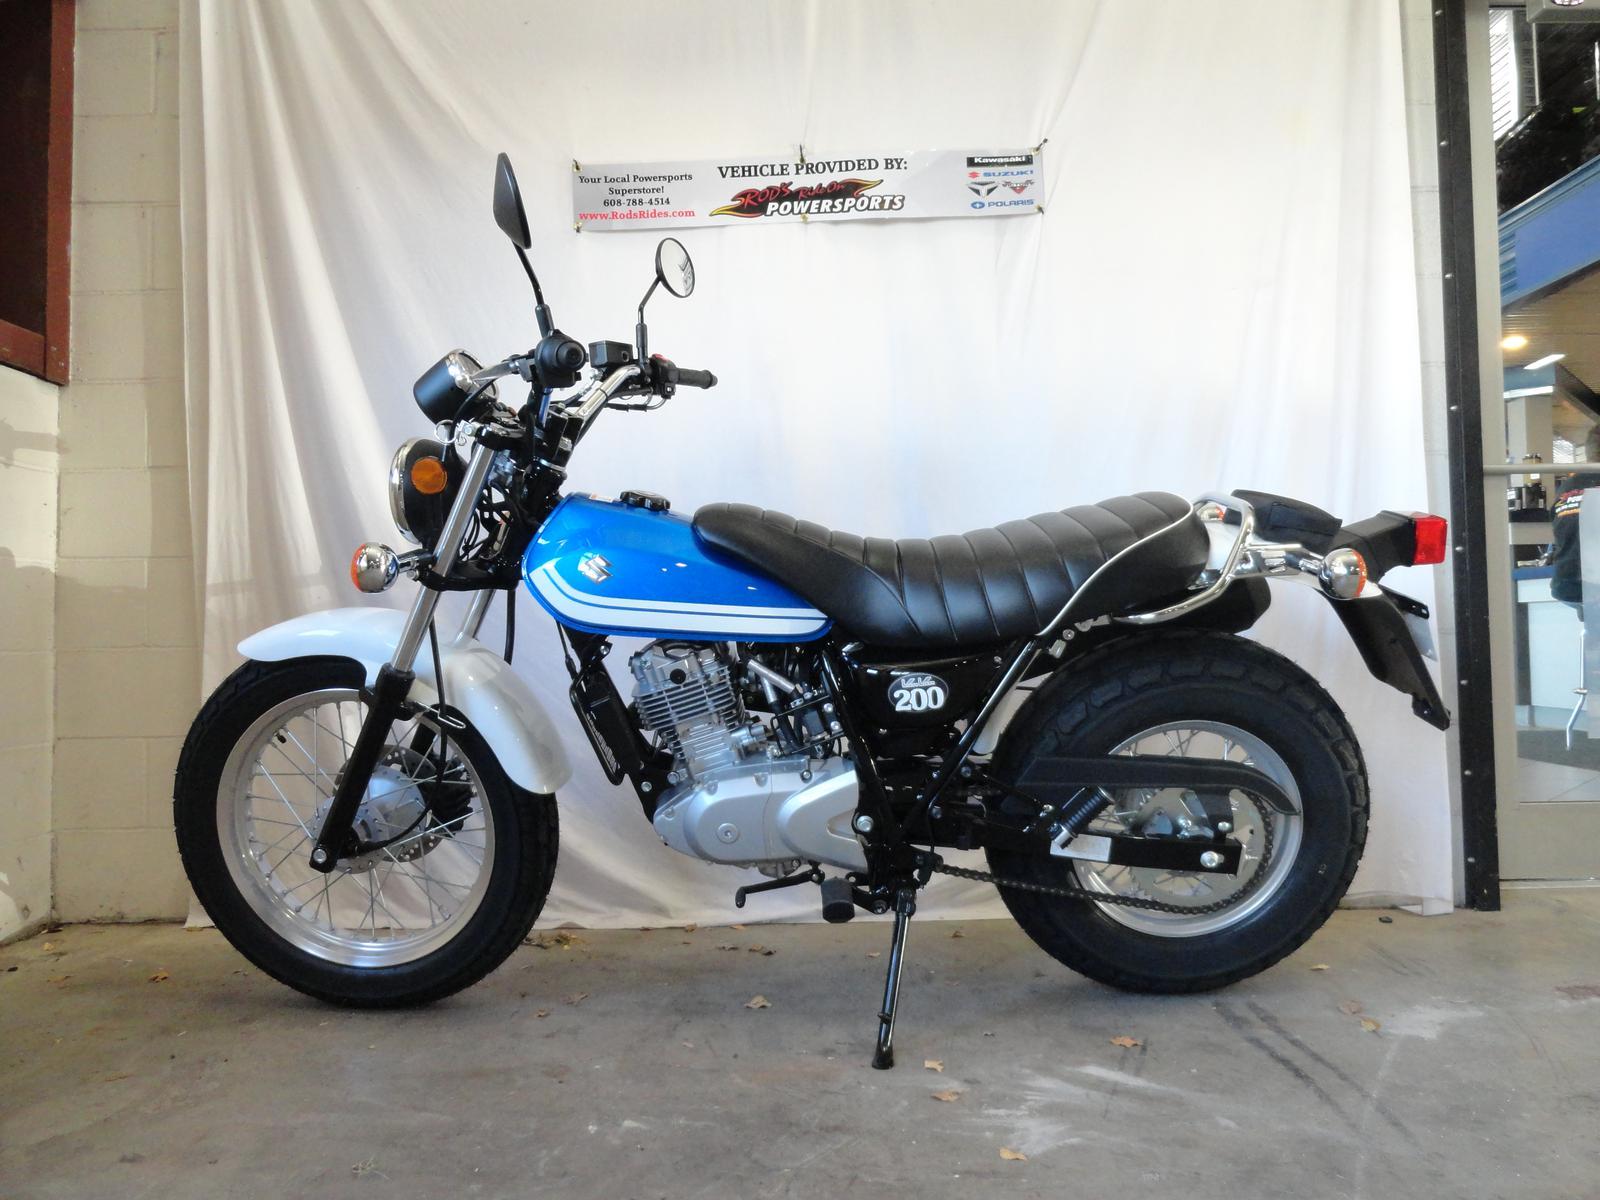 motorcycle rod's ride on powersports la crosse, wi (608) 788-4514